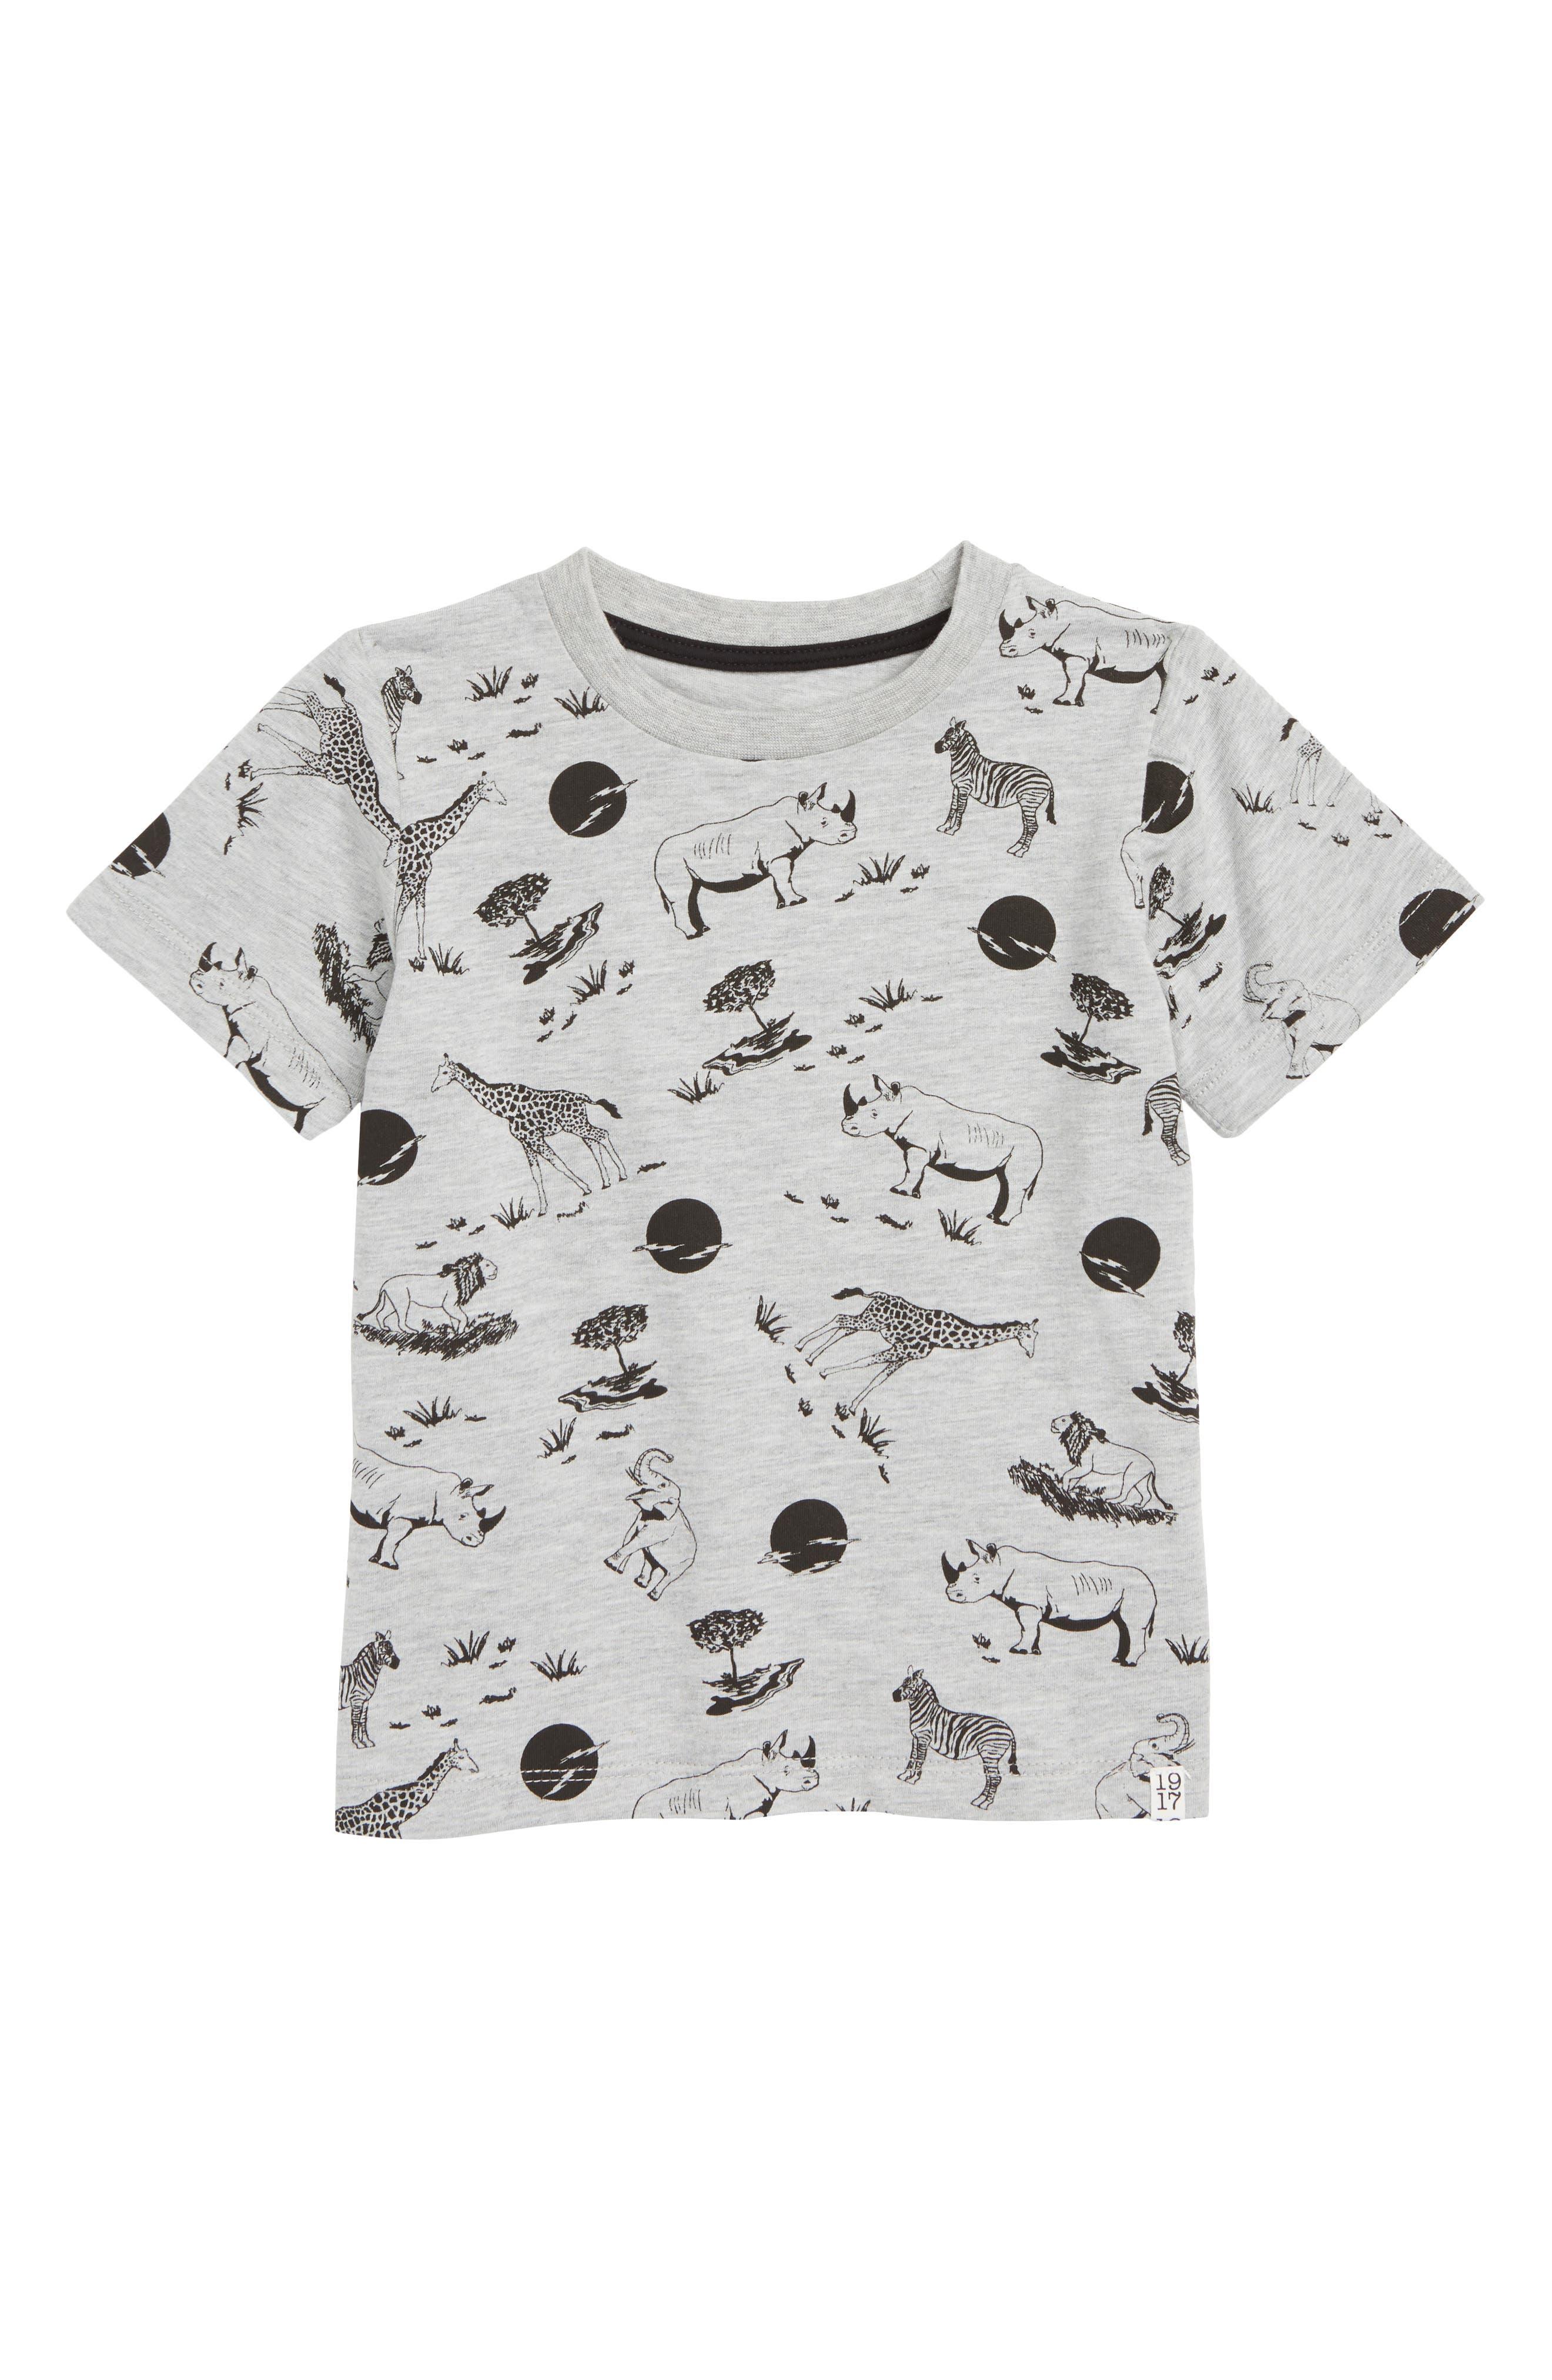 Loy T-Shirt,                         Main,                         color, SAFARI COLOR